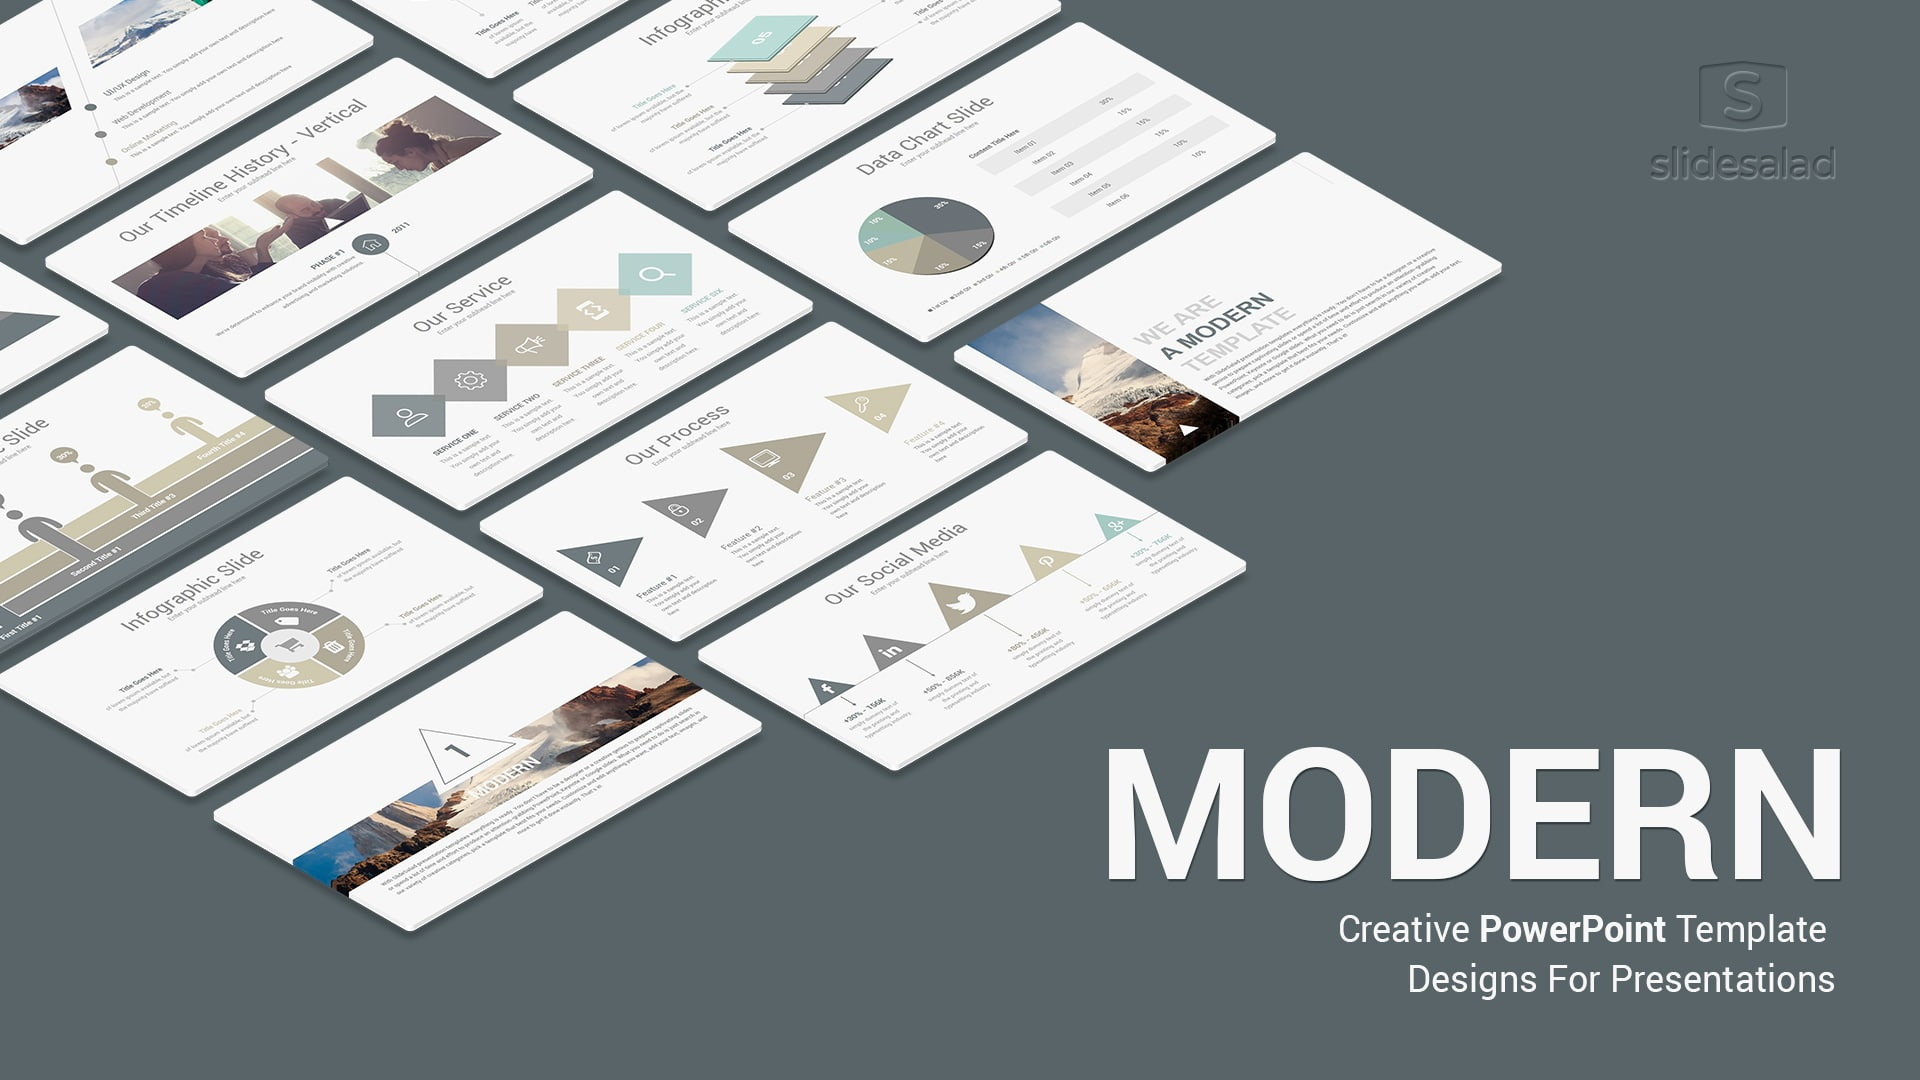 Modern-PowerPoint-Templates-PPT-Slides